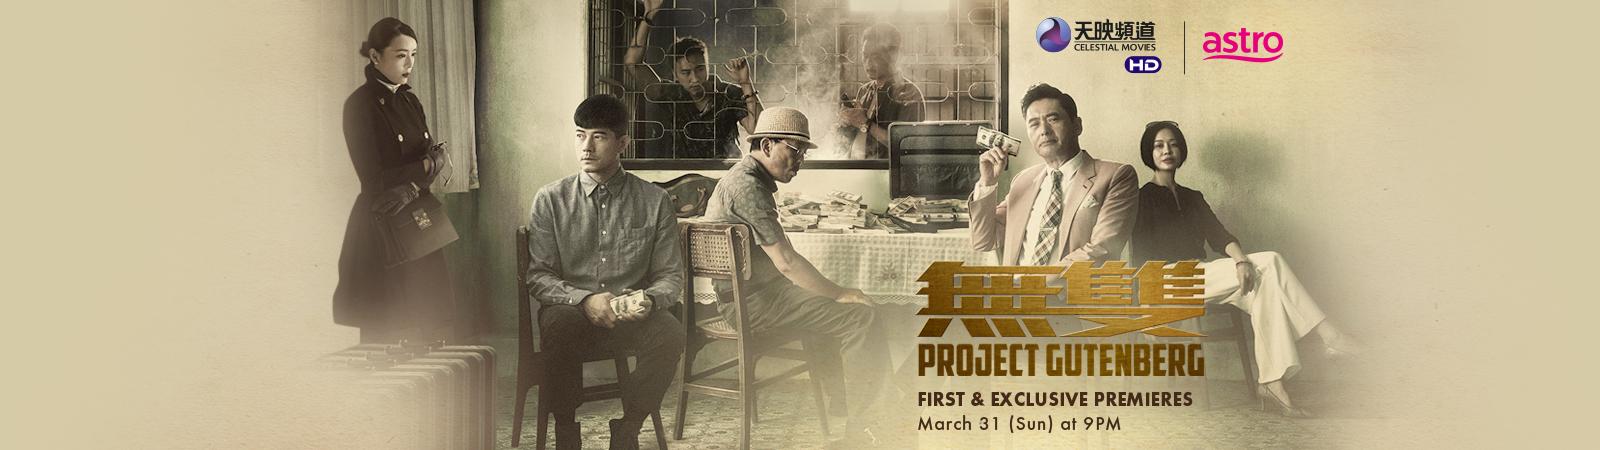 Project Gutenberg Premiere